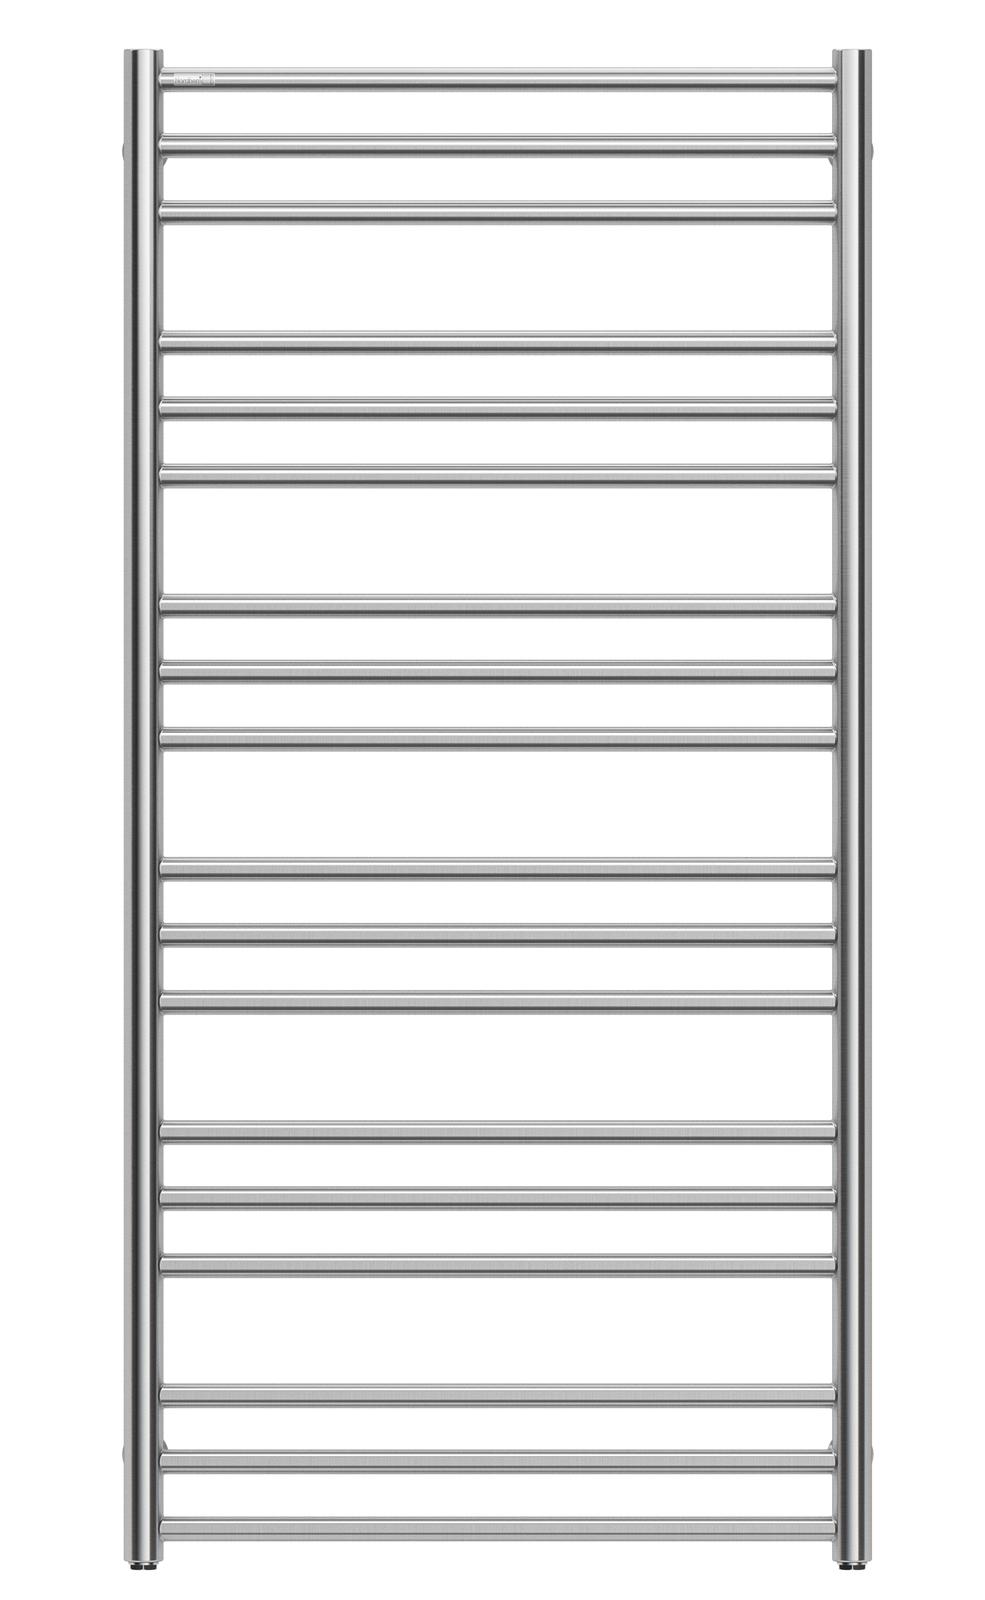 Nordhem handdukstork Solliden el rostfri, *1330x600mm/300w